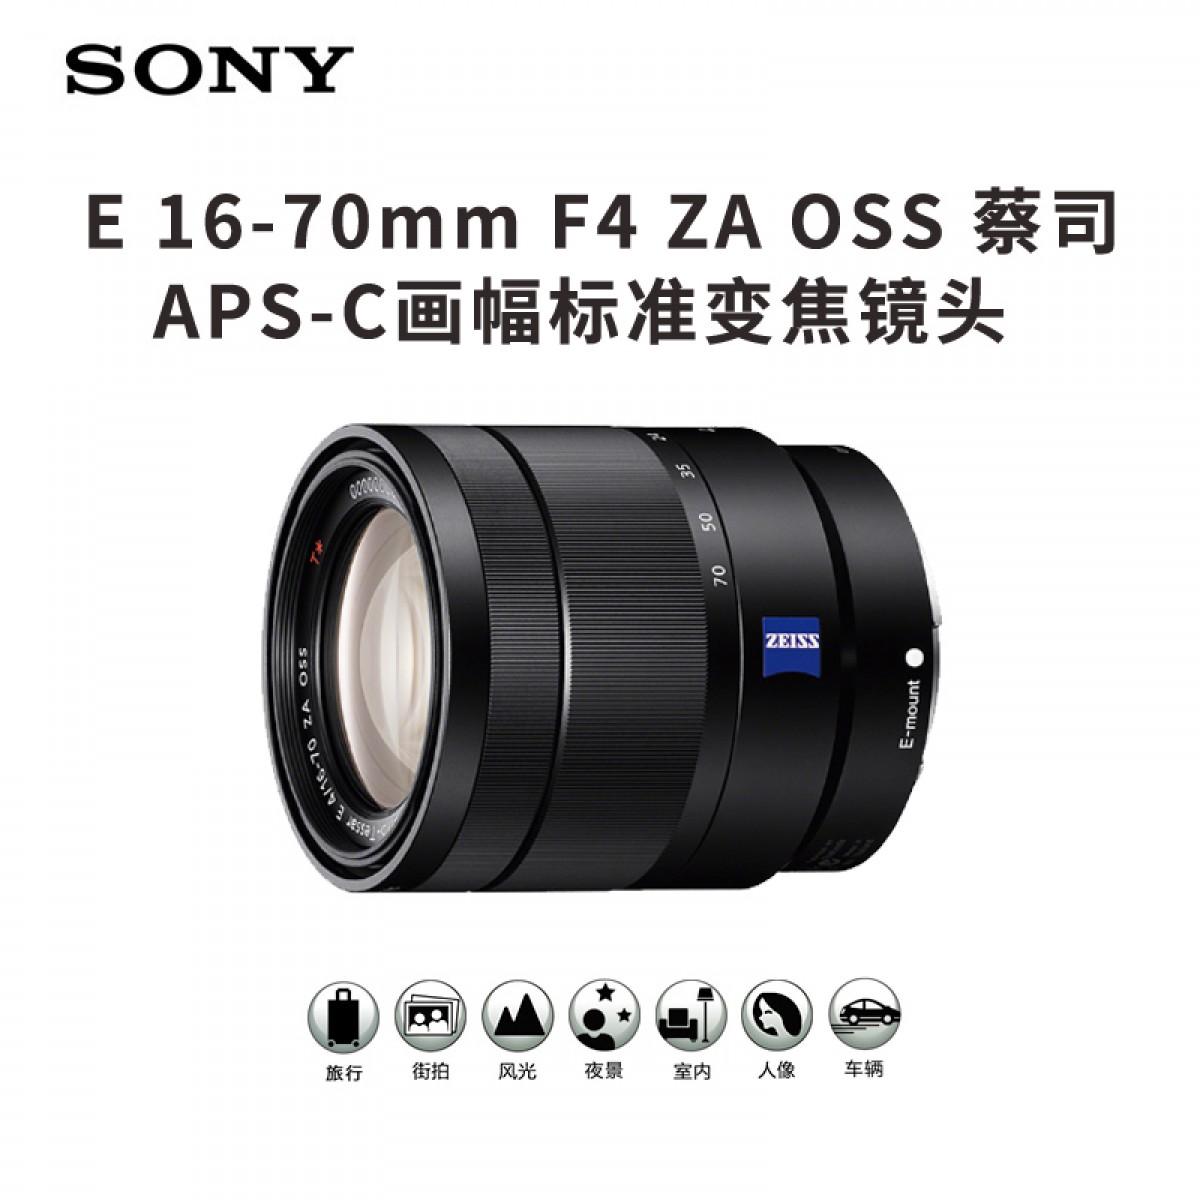 Sony/索尼 E16-70mm F4 ZA OSS SEL1670Z C 微单广角变焦蔡司镜头